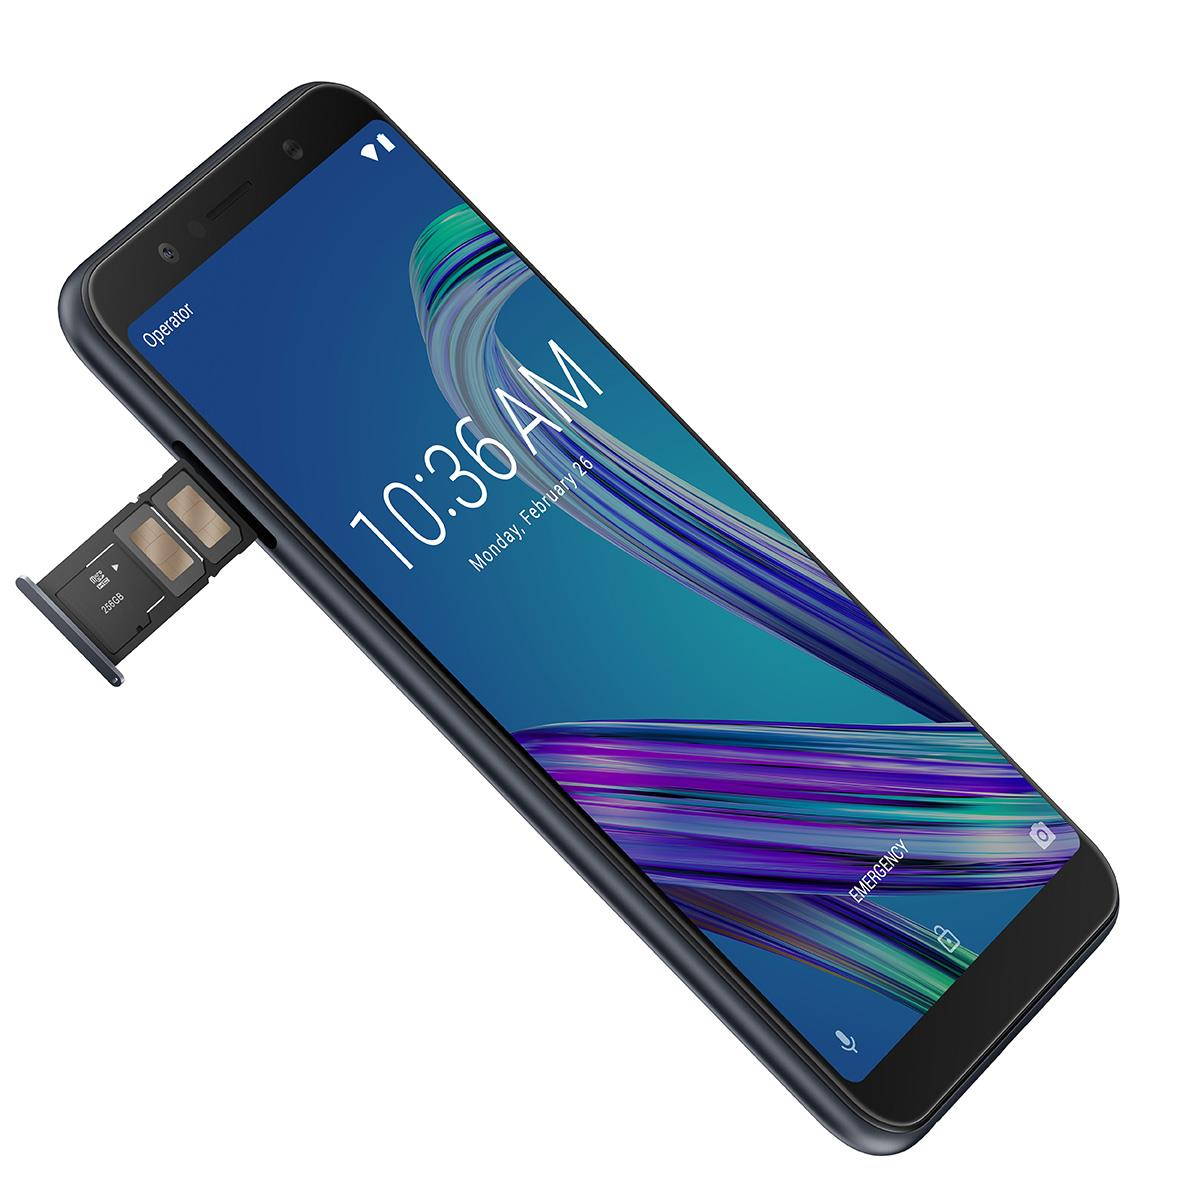 Image Gallery – Full Resolution ZenFone Max Pro M1 High